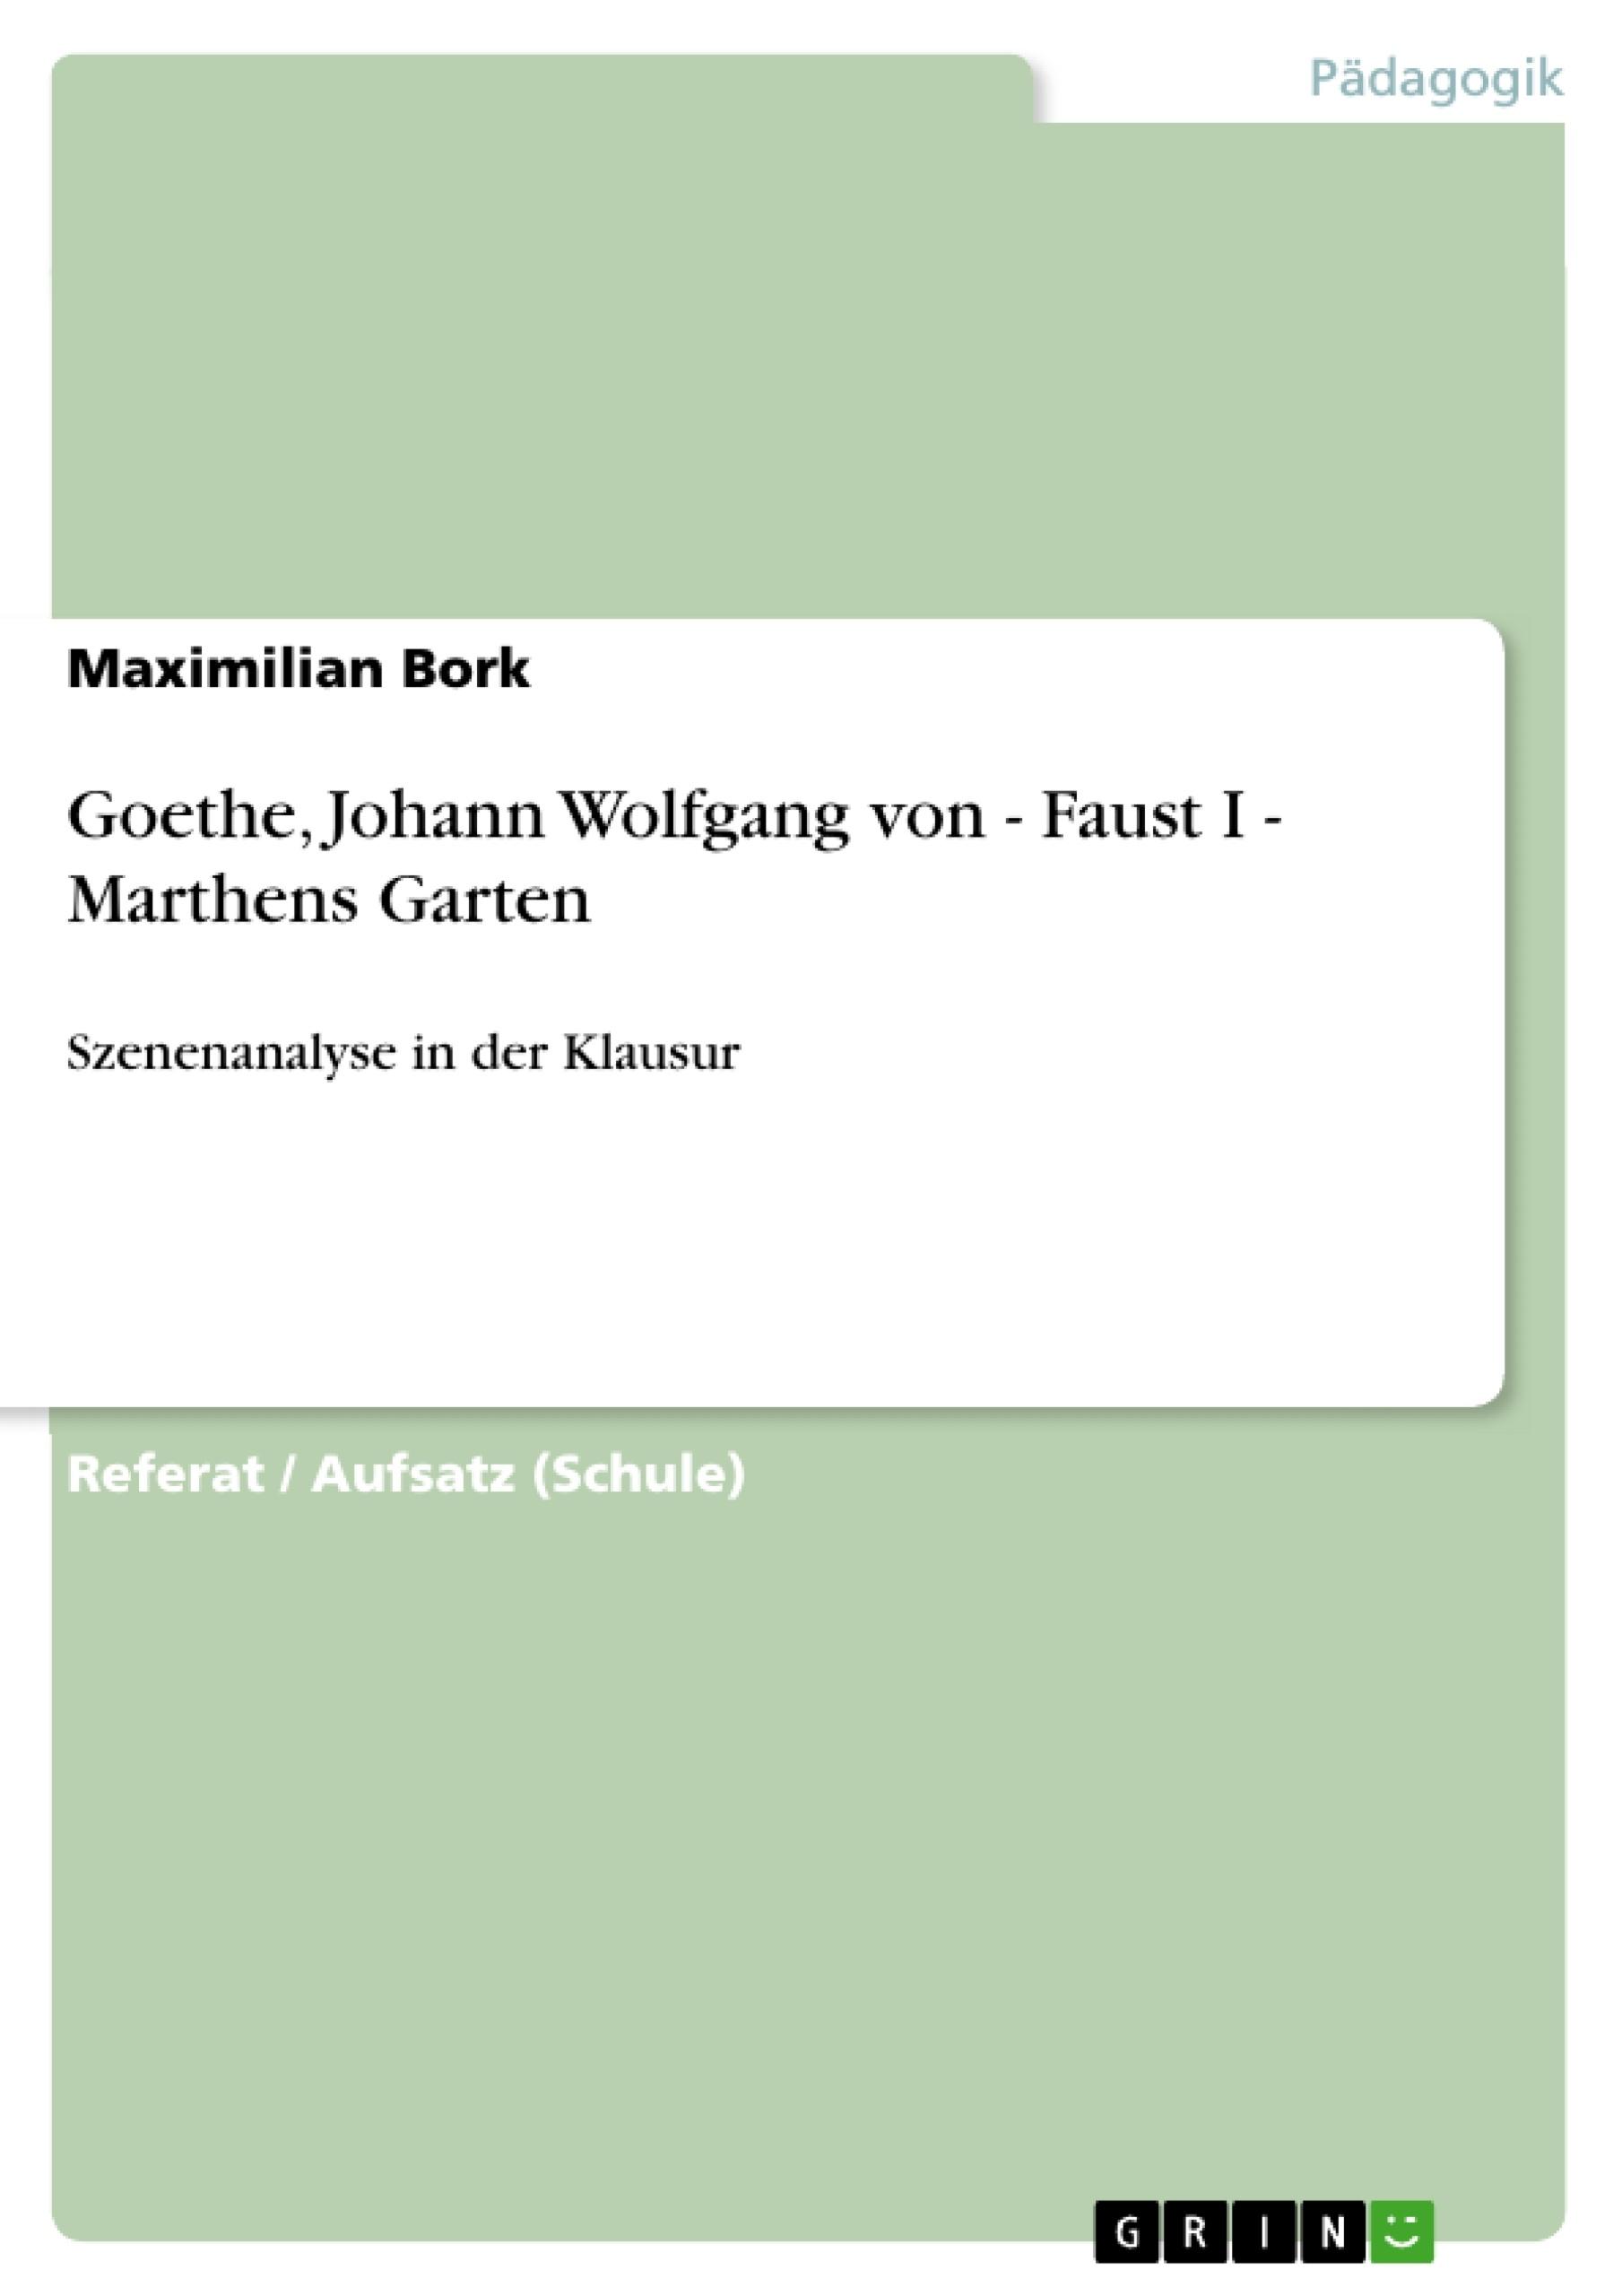 Titel: Goethe, Johann Wolfgang von - Faust I - Marthens Garten